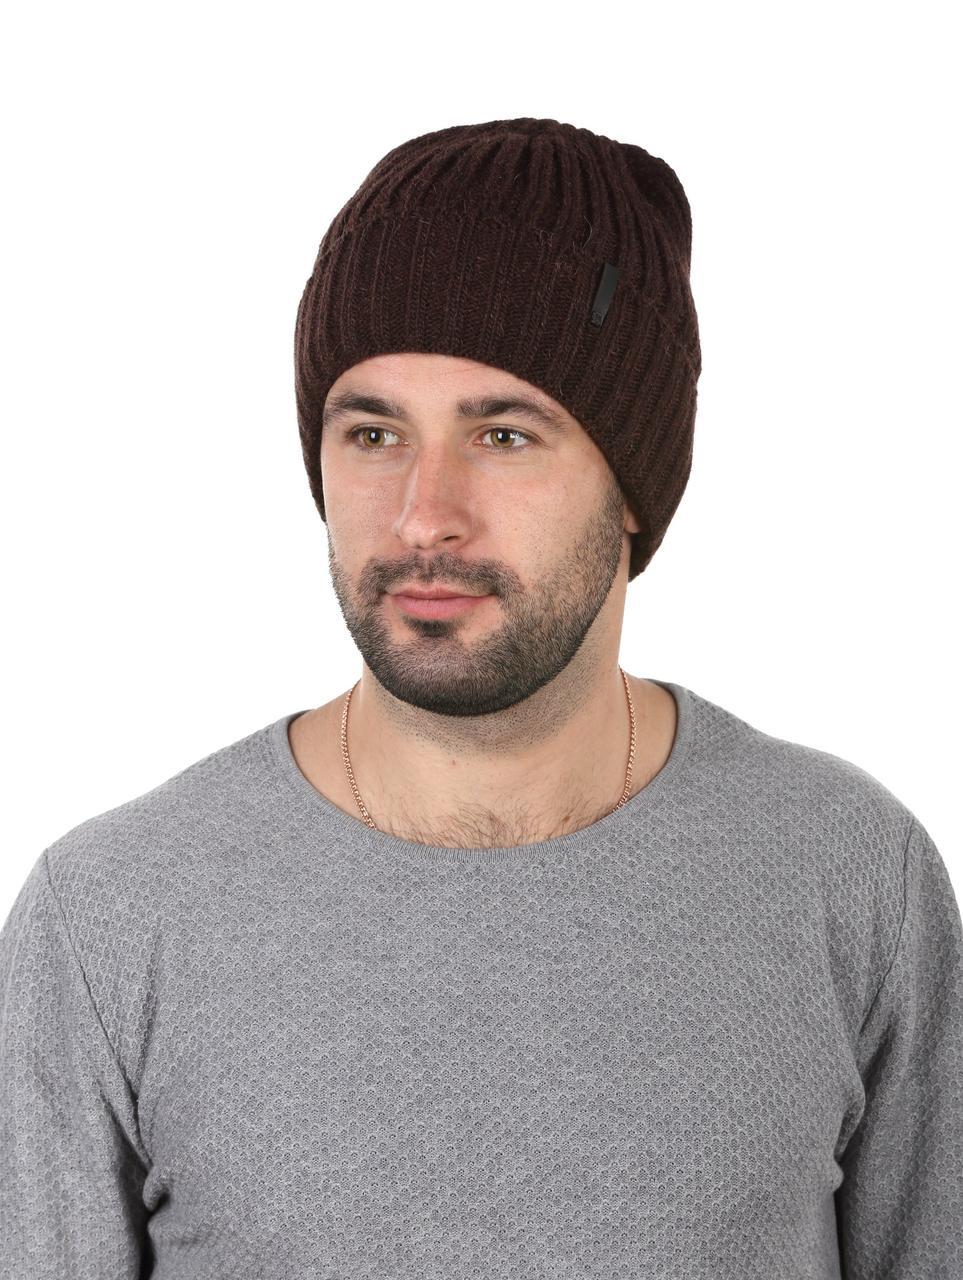 Шапка вязаная мужская утепленная  коричневая